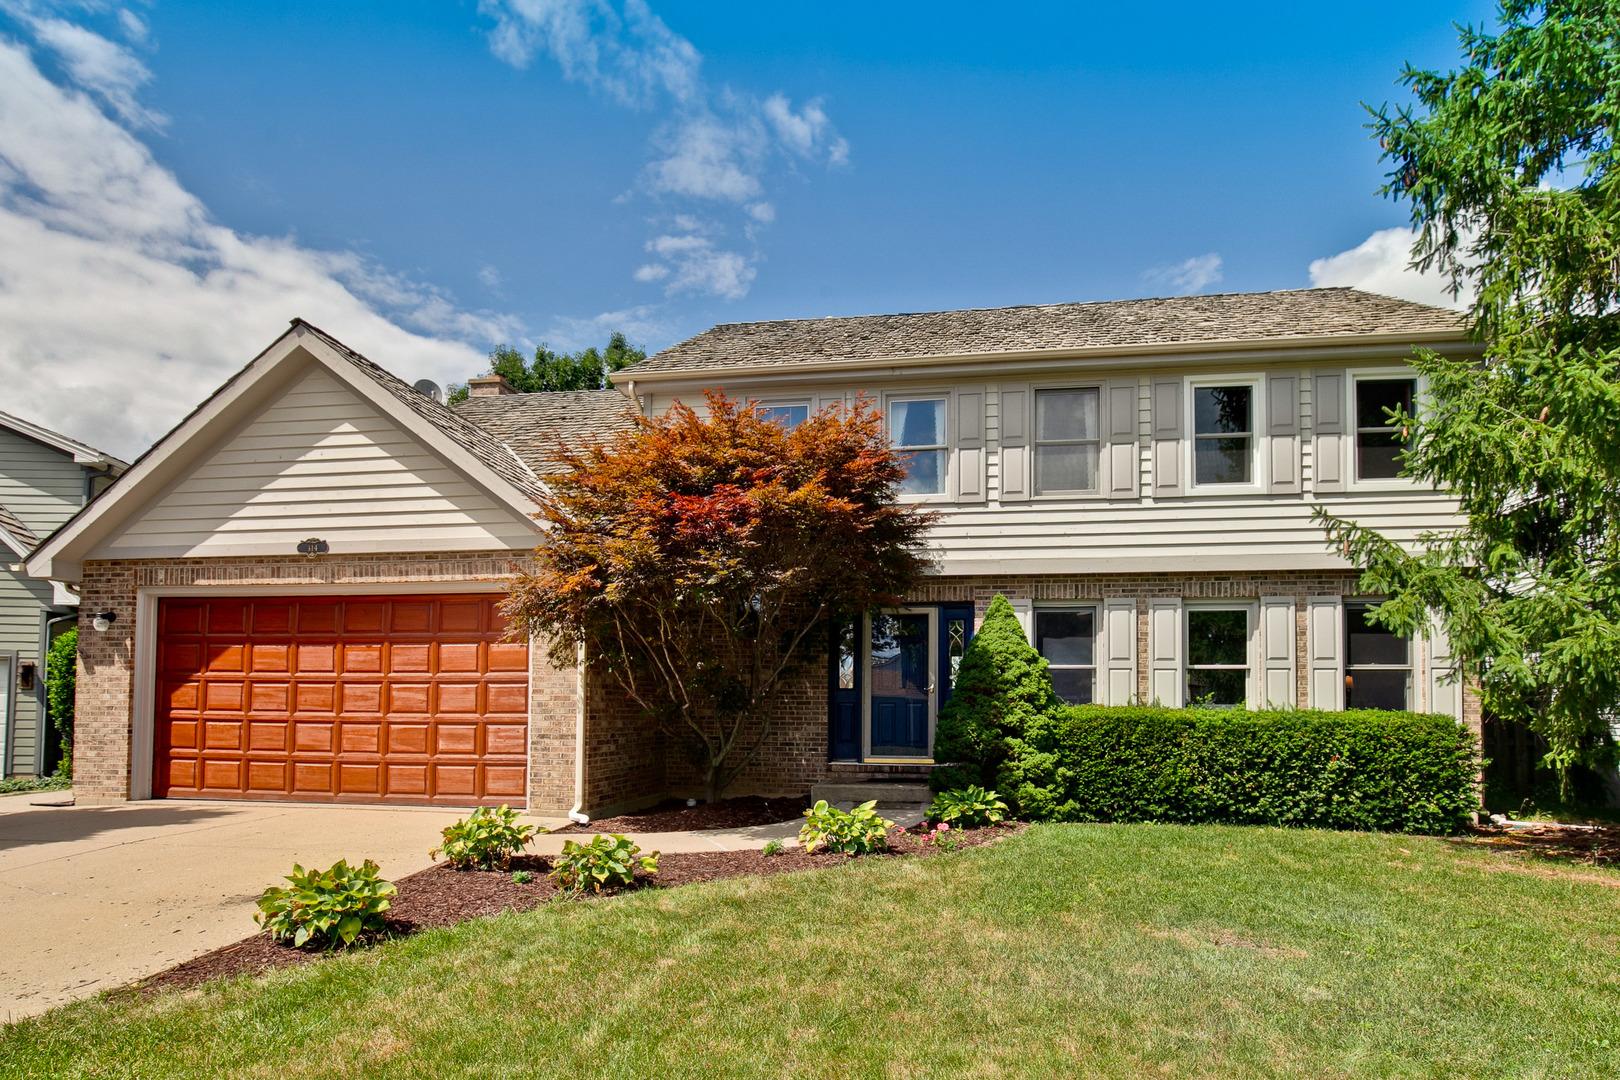 414 Wicks Street, Grayslake, Illinois 60030